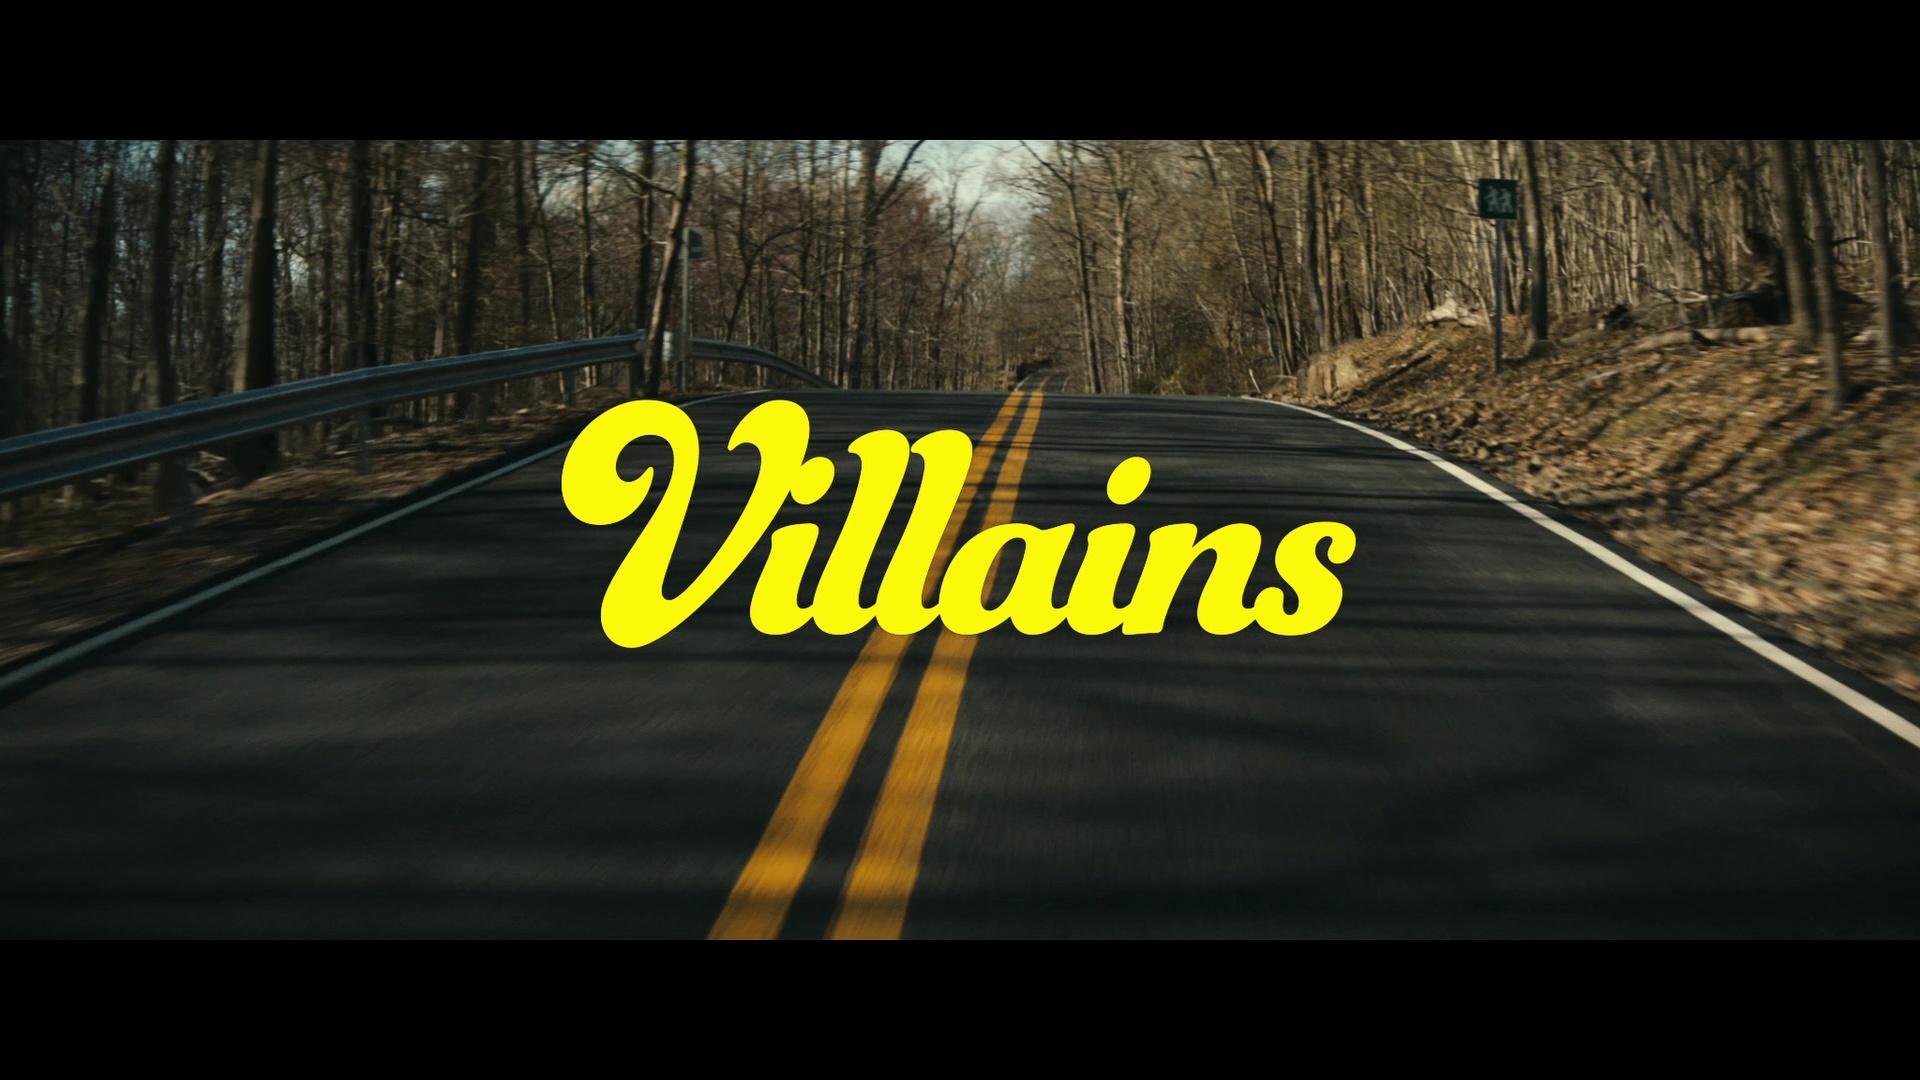 Villanos (2019) 1080p BRrip Latino